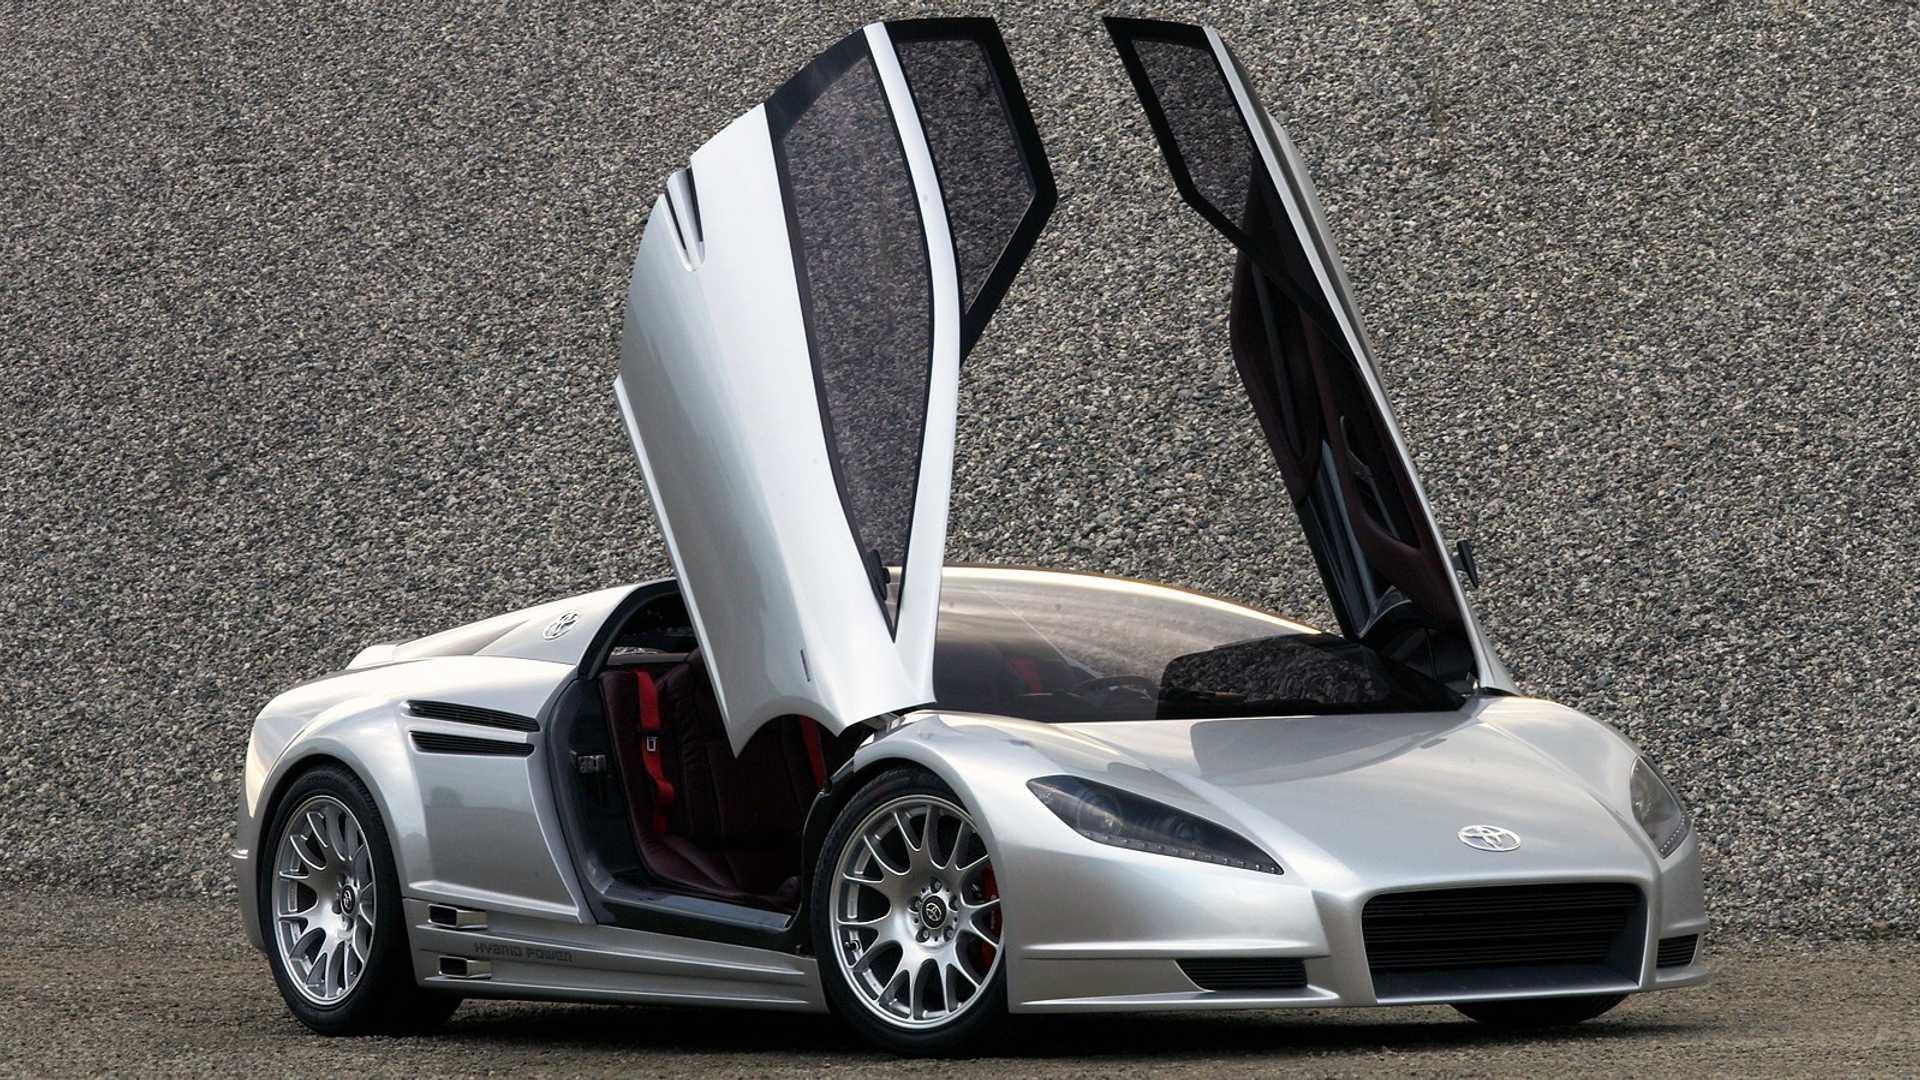 Toyota-Alessandro-Volta-concept-2004-19